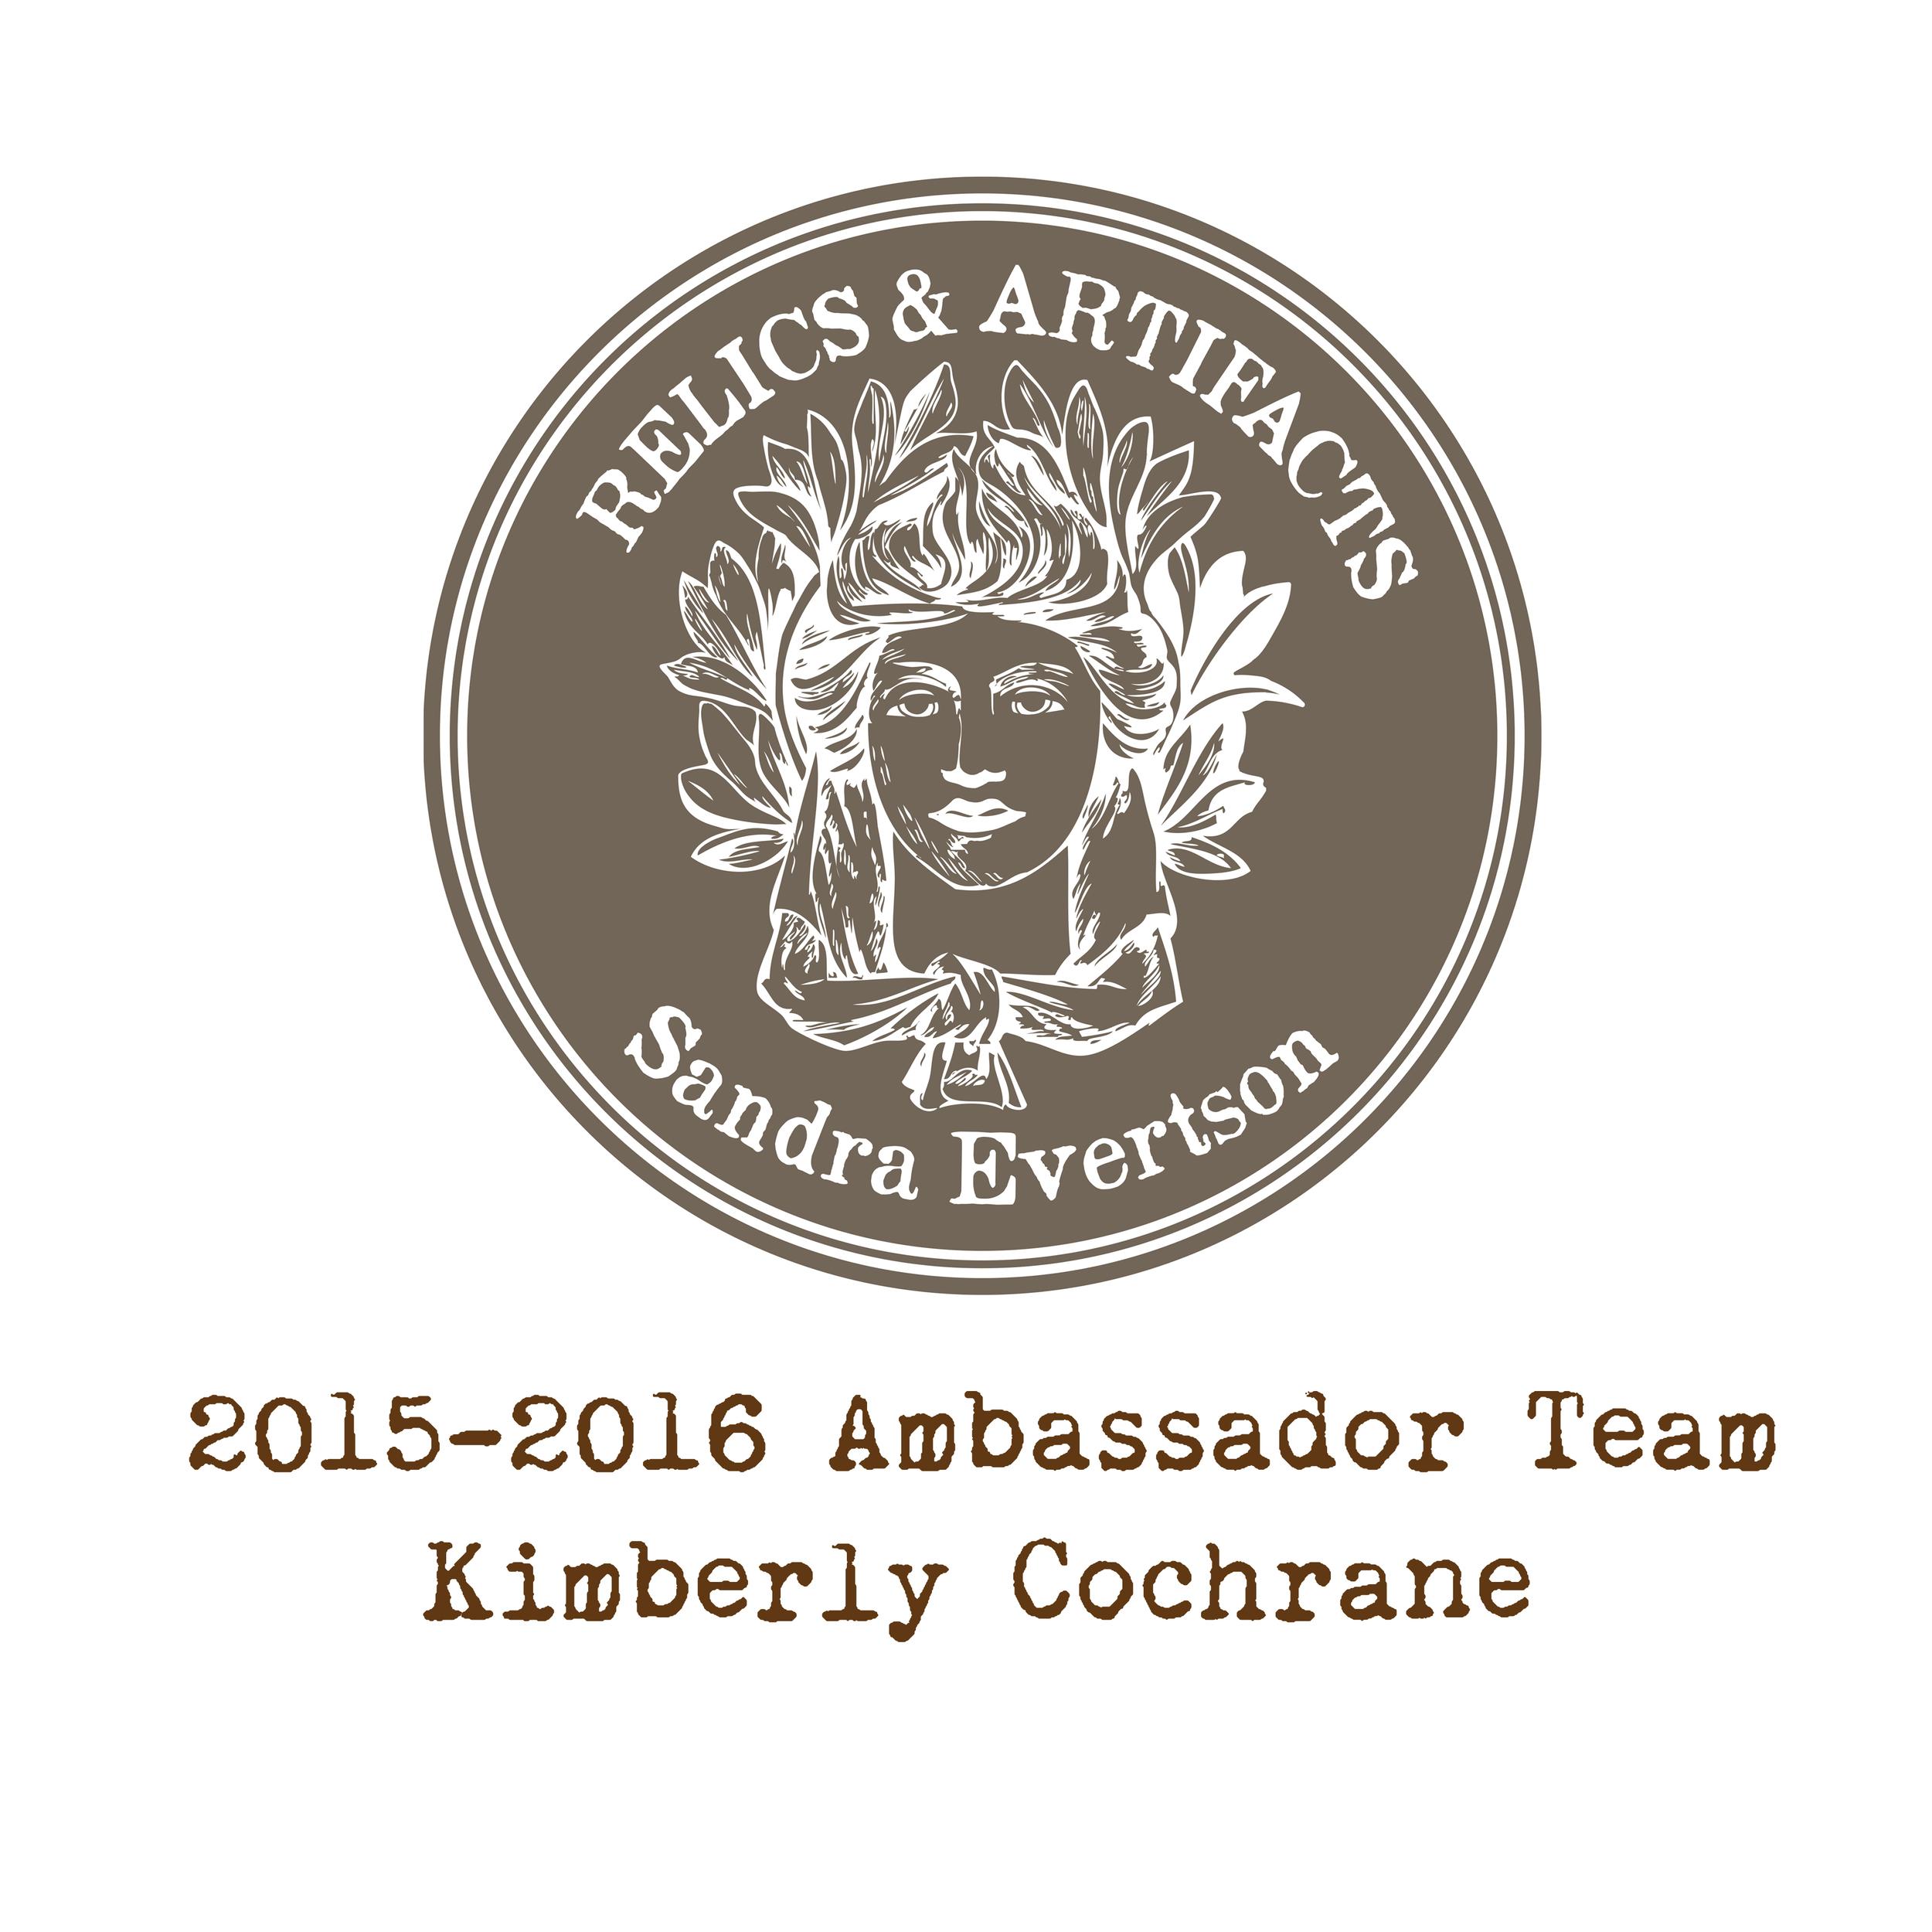 RELICS & ARTIFACTS® Ambassador Snapshot | Kimberly Cochrane